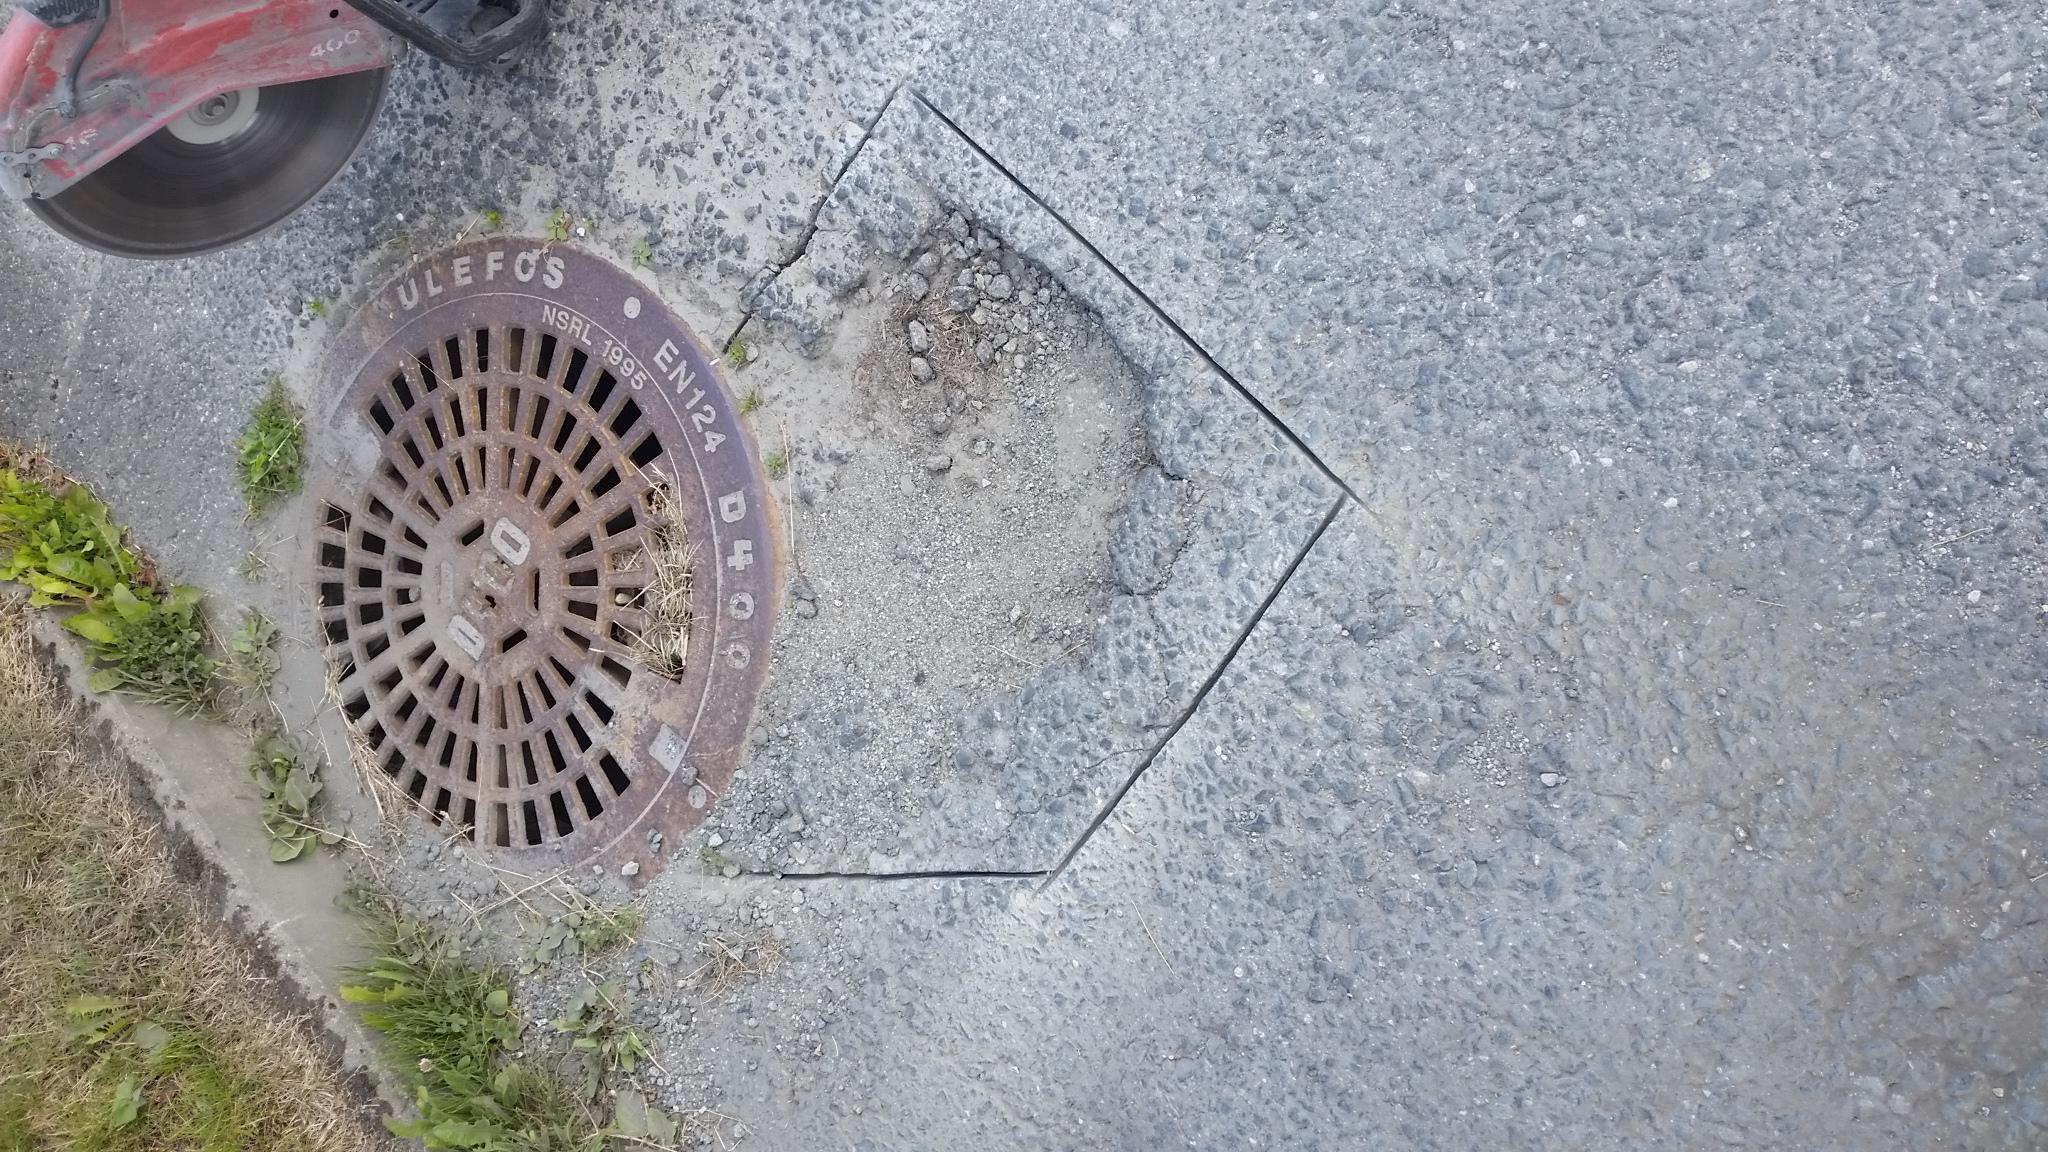 asfalt reparasjon